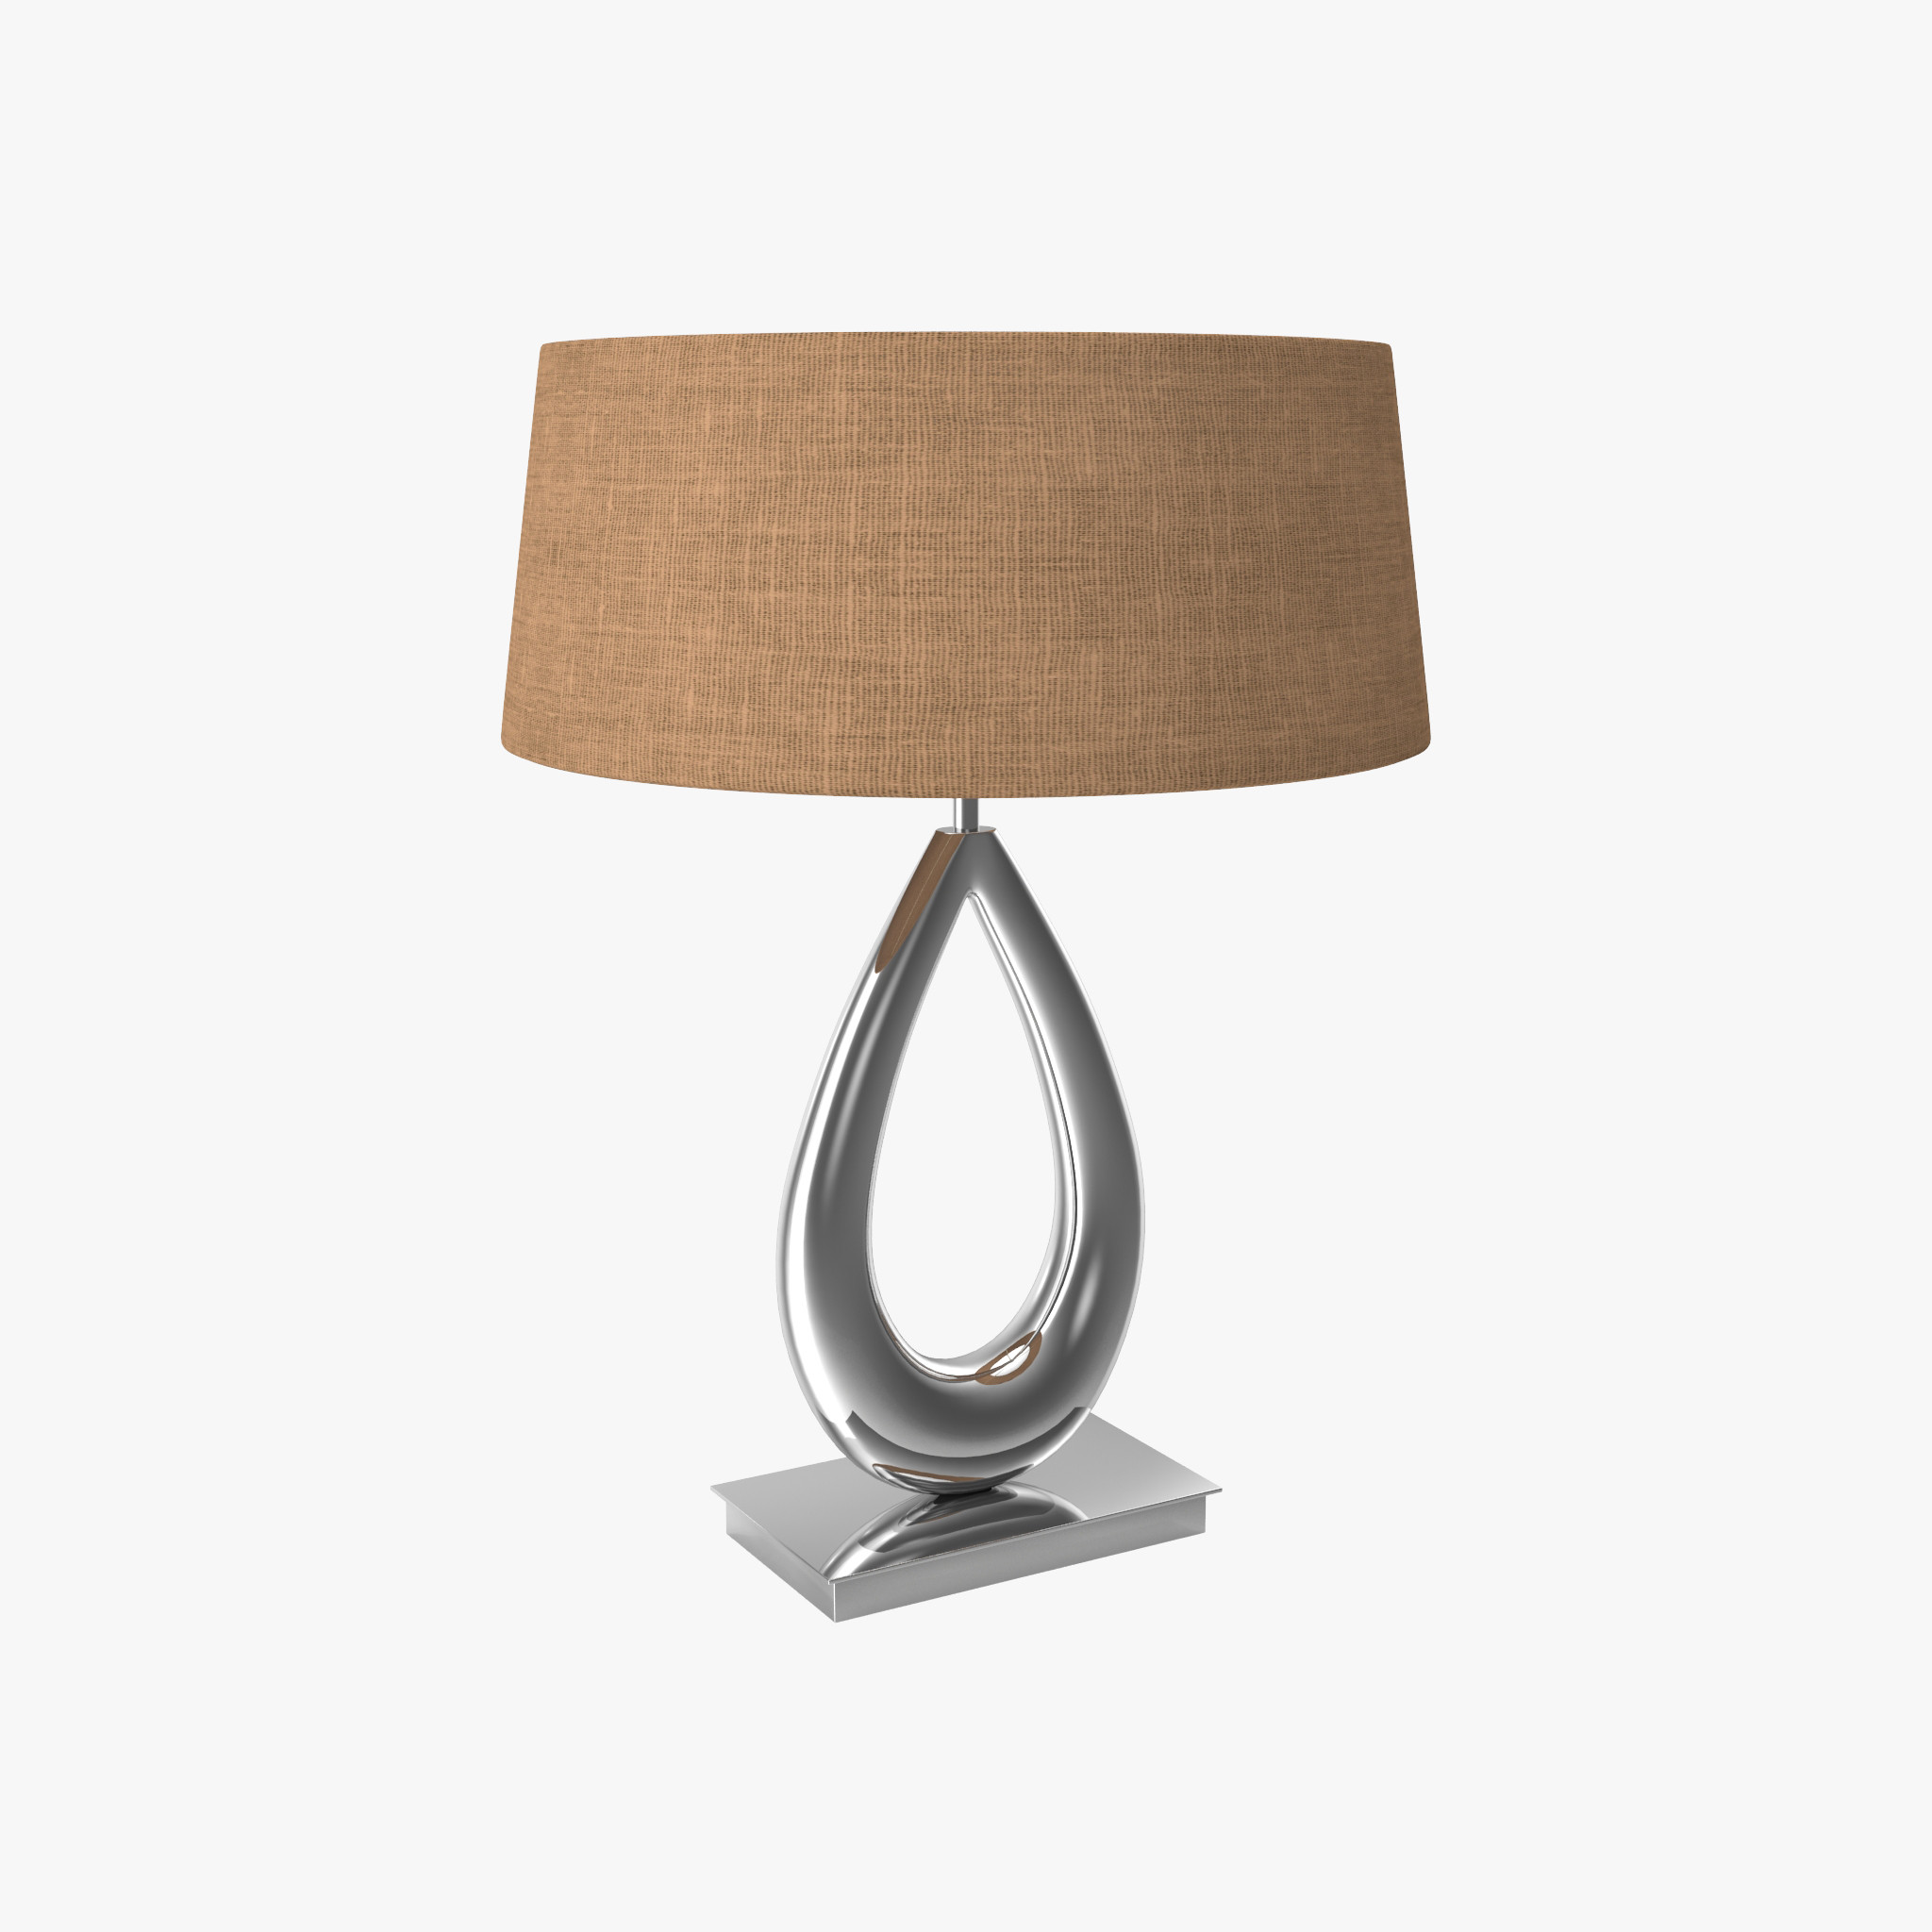 Chelsom Nickel Sculpture Collar Table Lamp prev2a.jpg